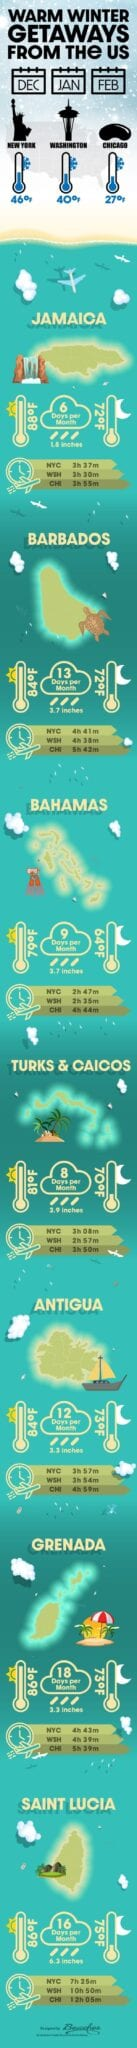 Infographic Warm Winter Getaway Destinations